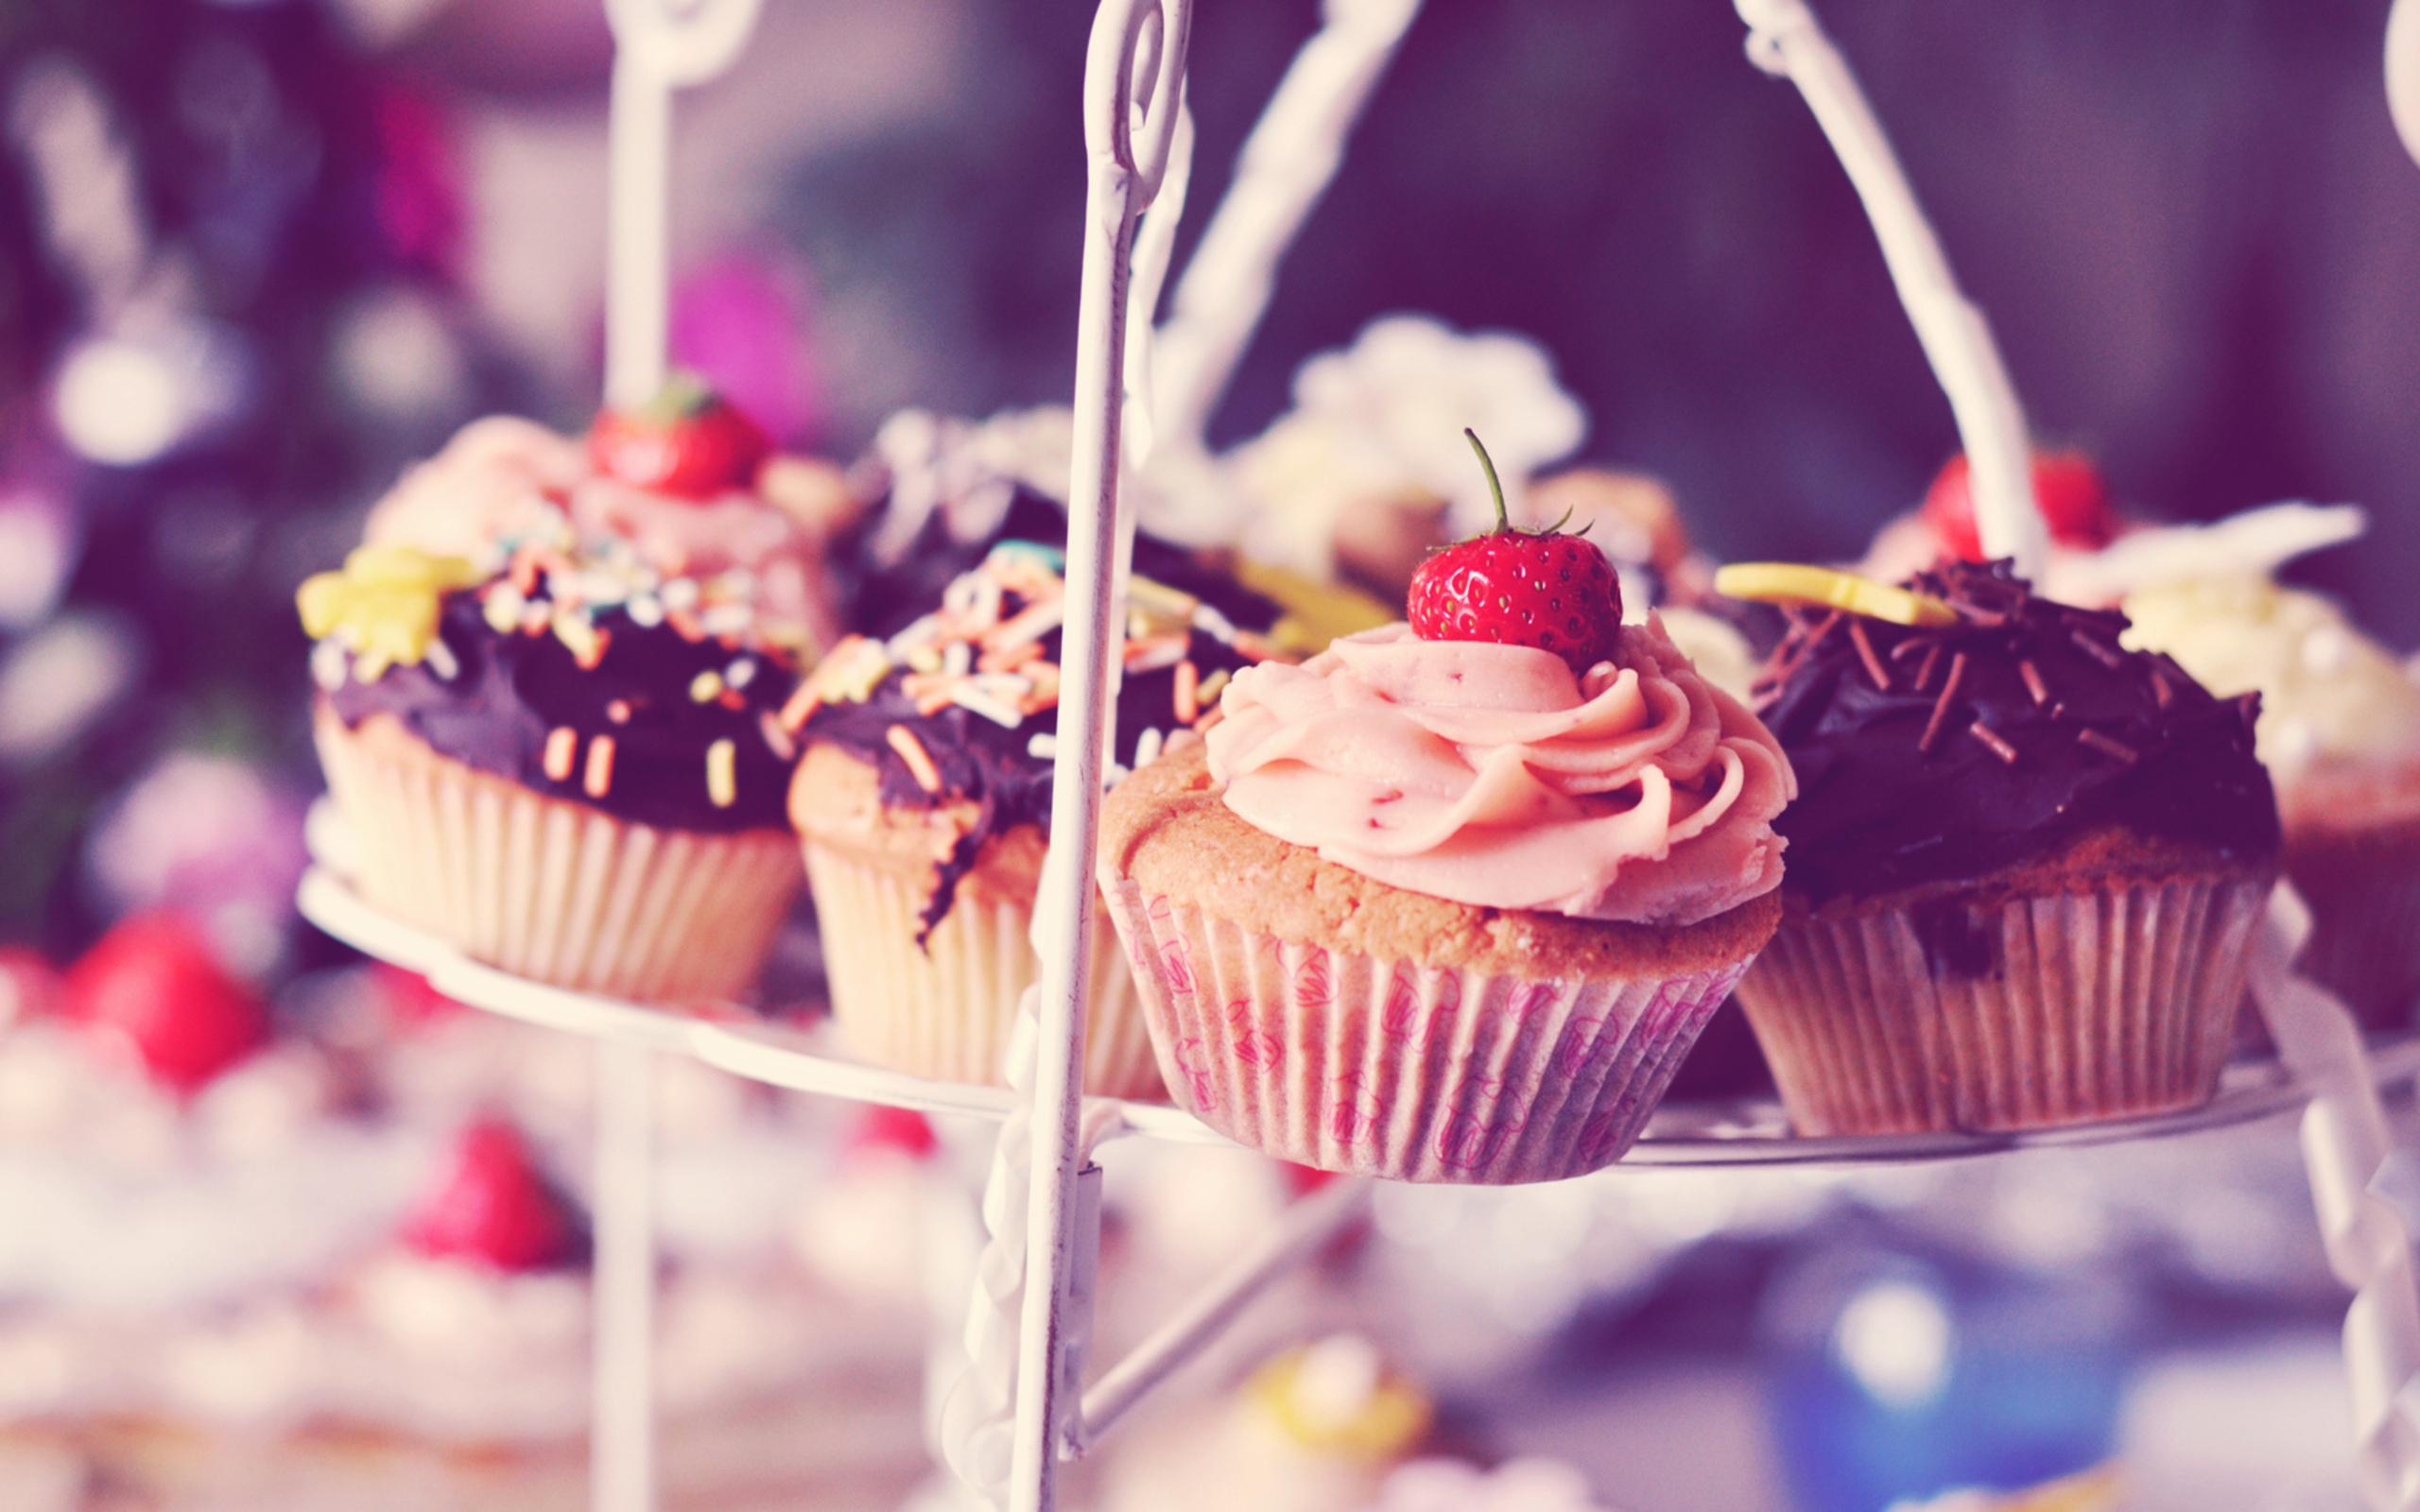 yummy cupcake image